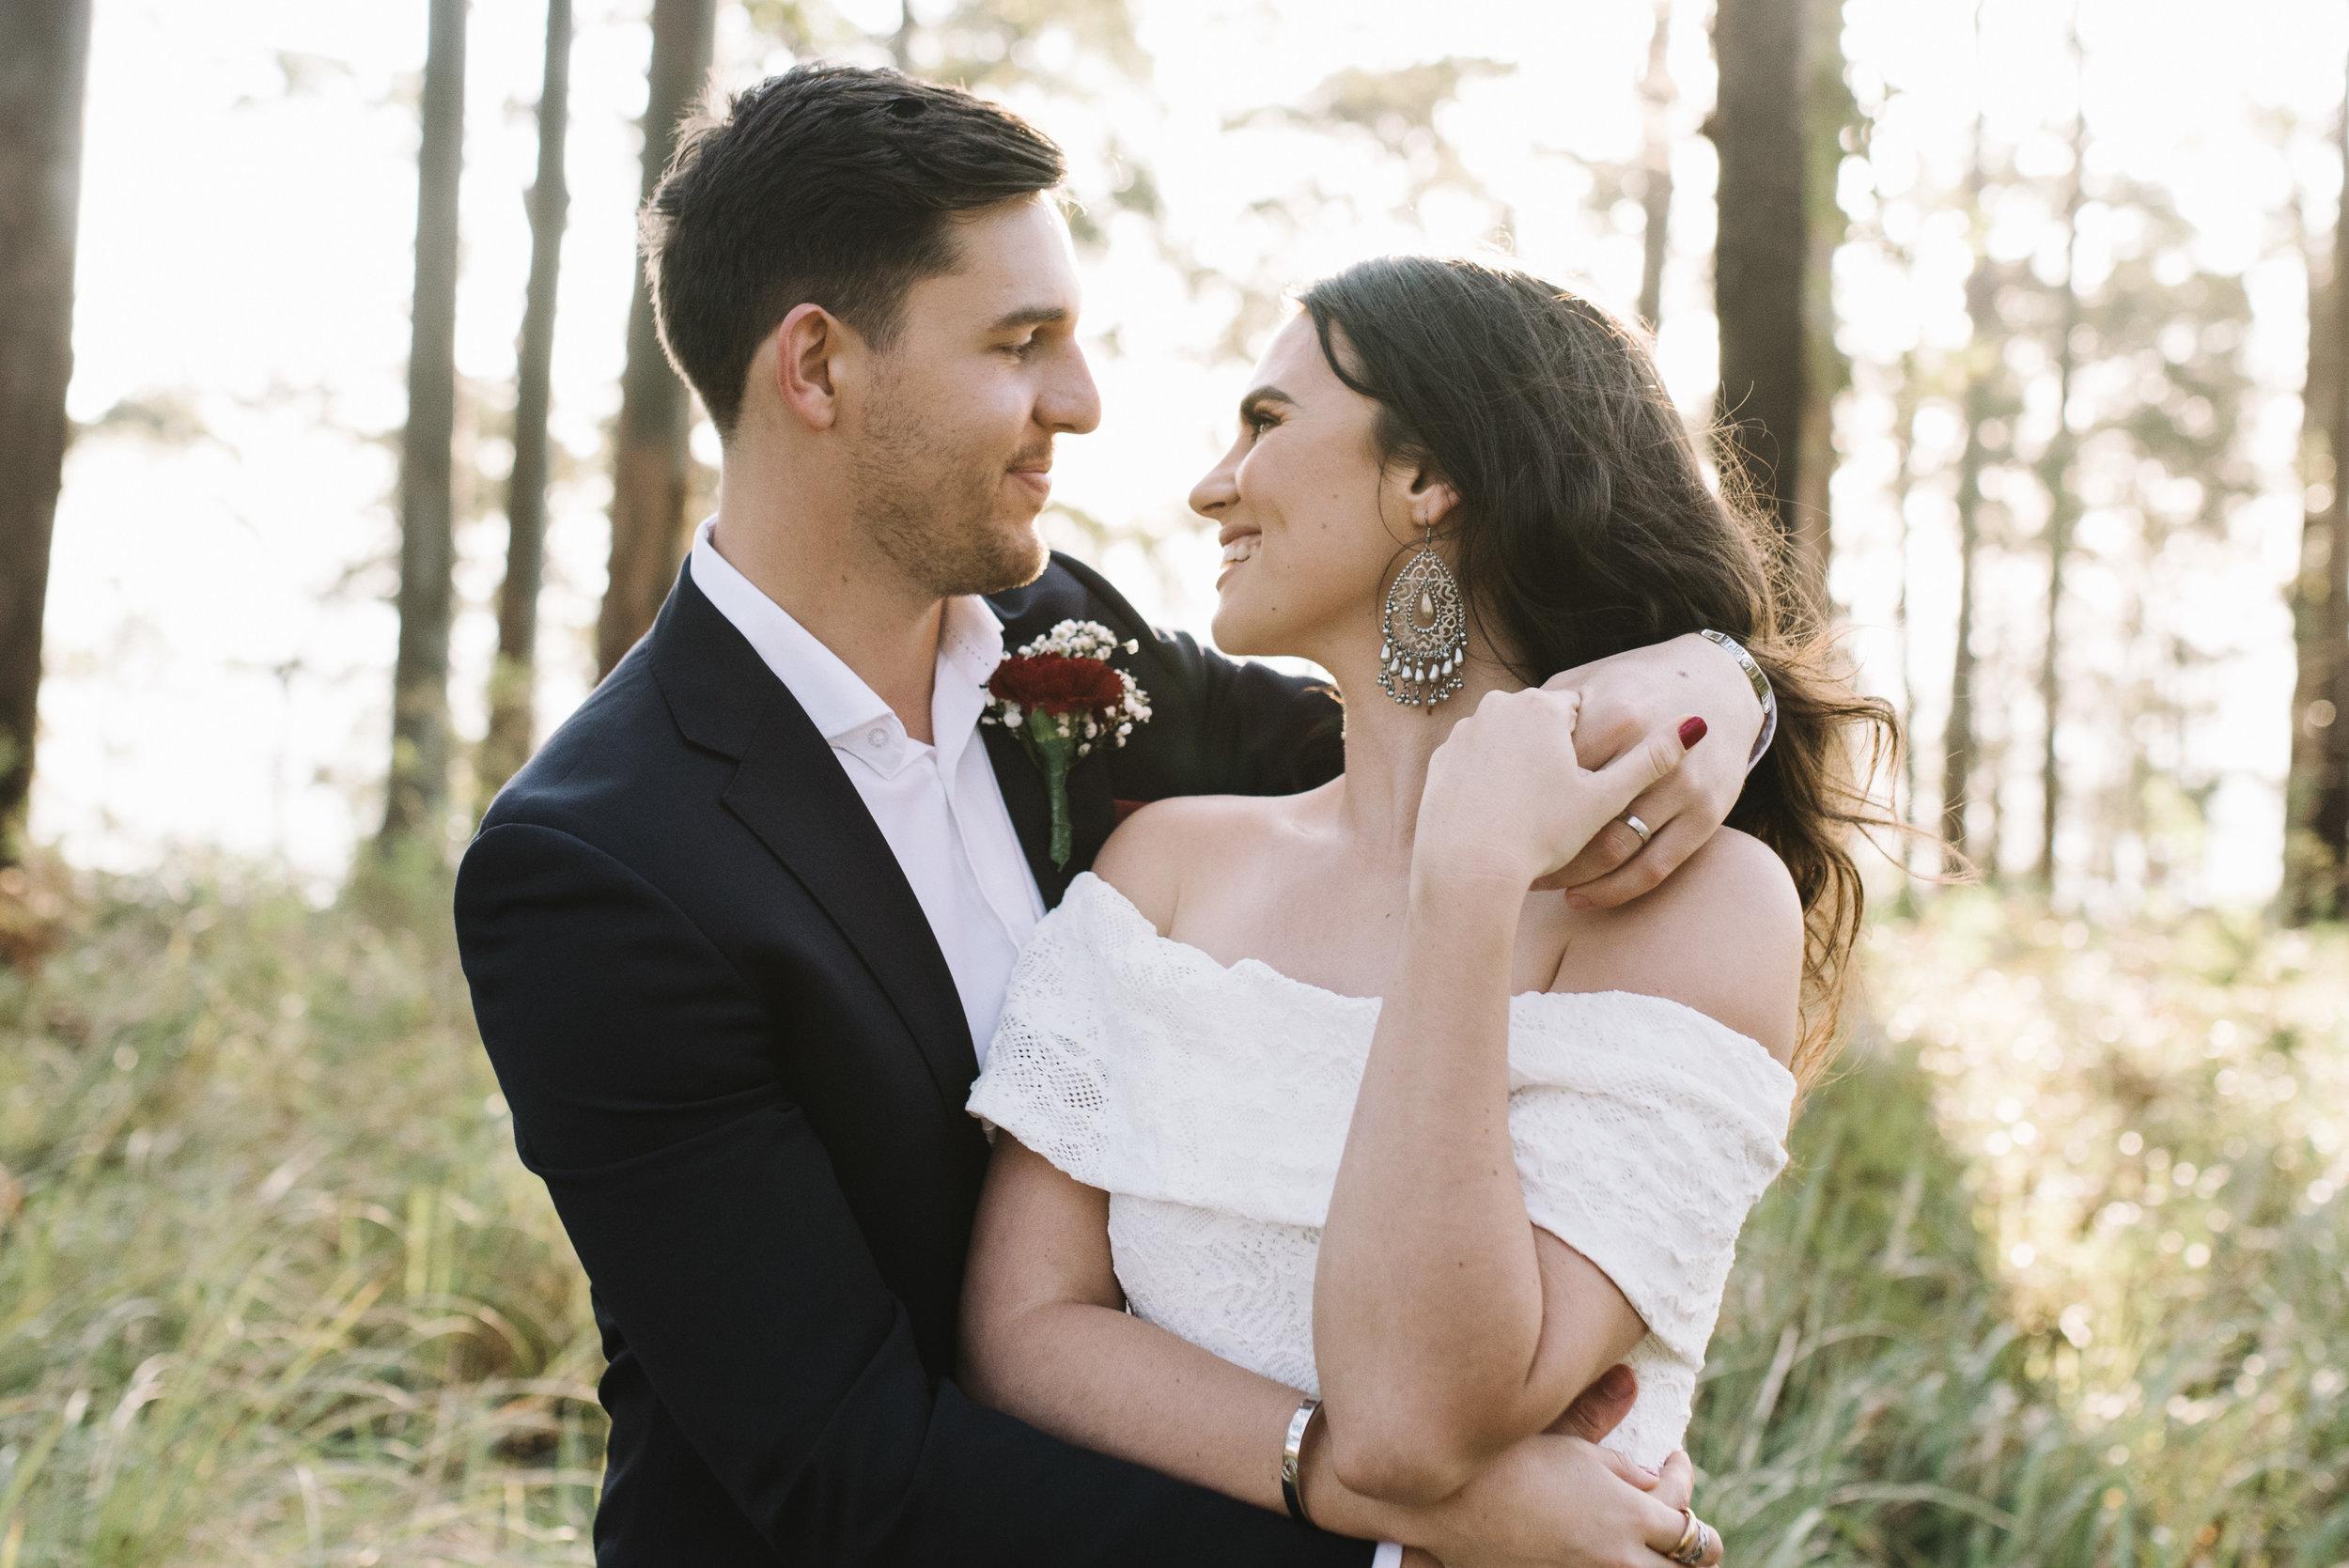 brisbane-gold-coast-sunshine-coast-wedding-photographer-mount-tamborine-wedding-1-52.jpg